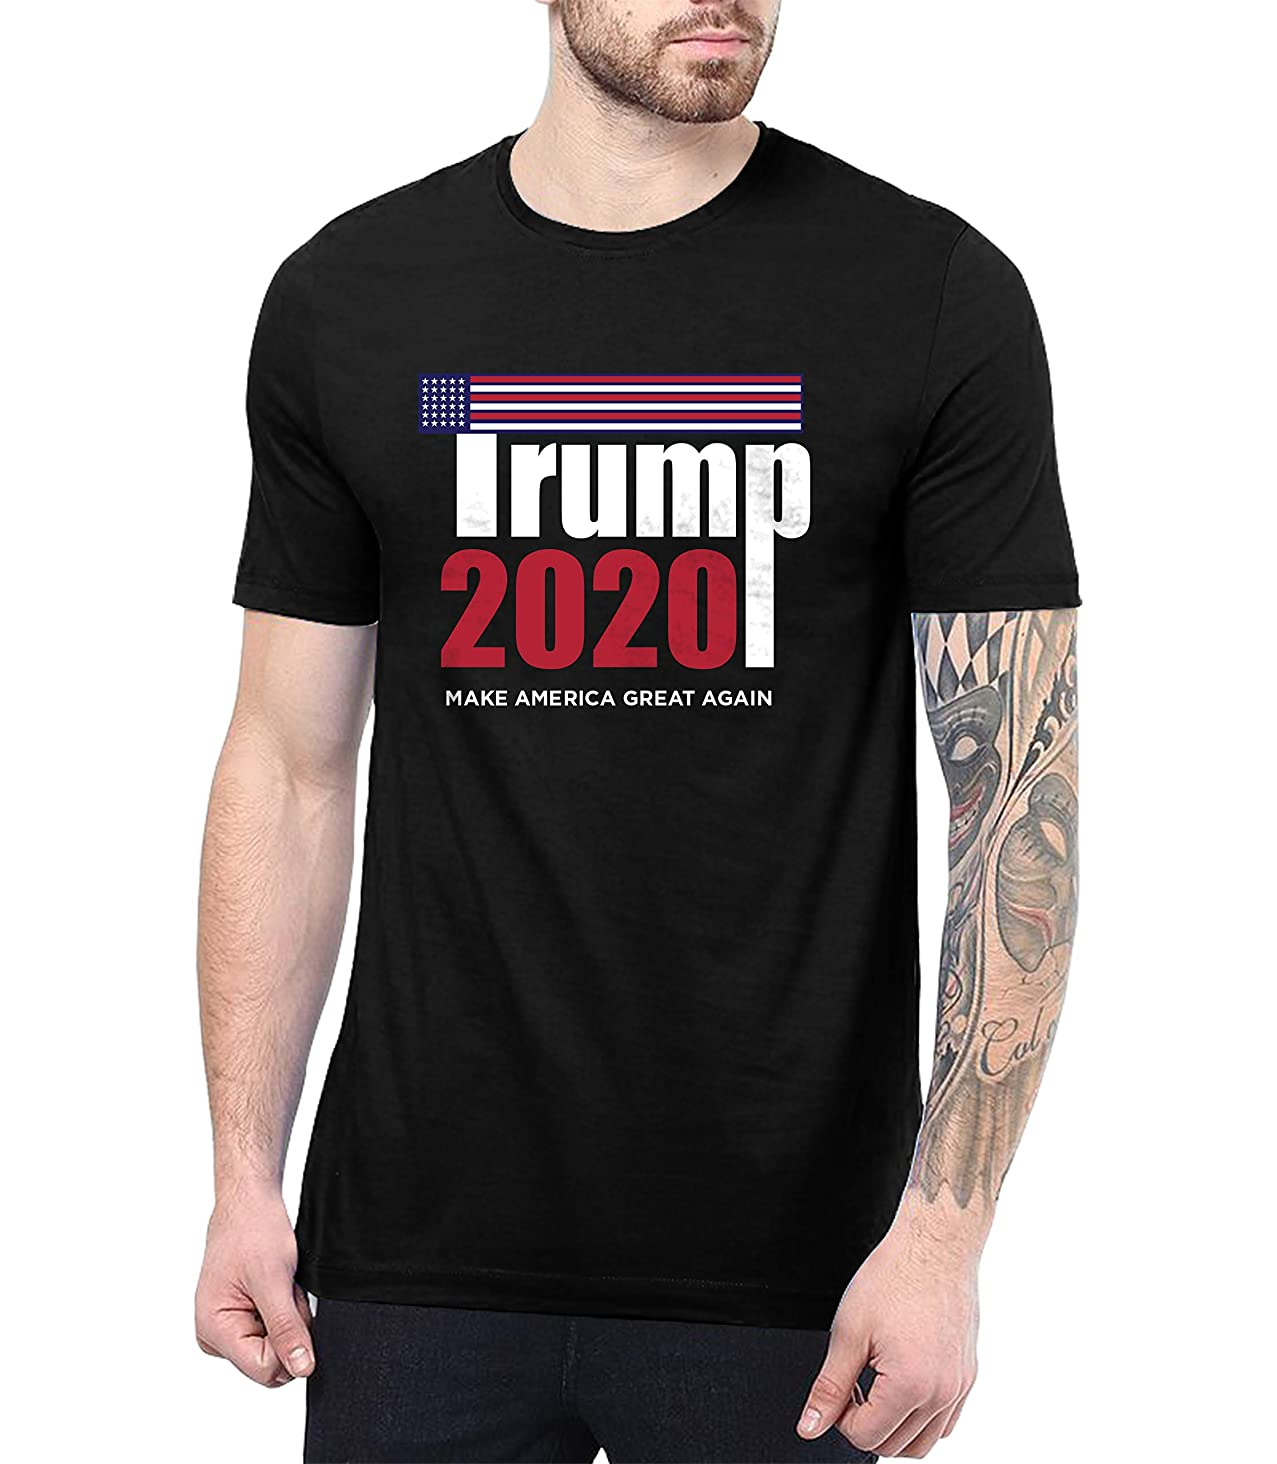 President Donald Trump 2020 Shirt US Flag - Make America Great Again Shirt for Men